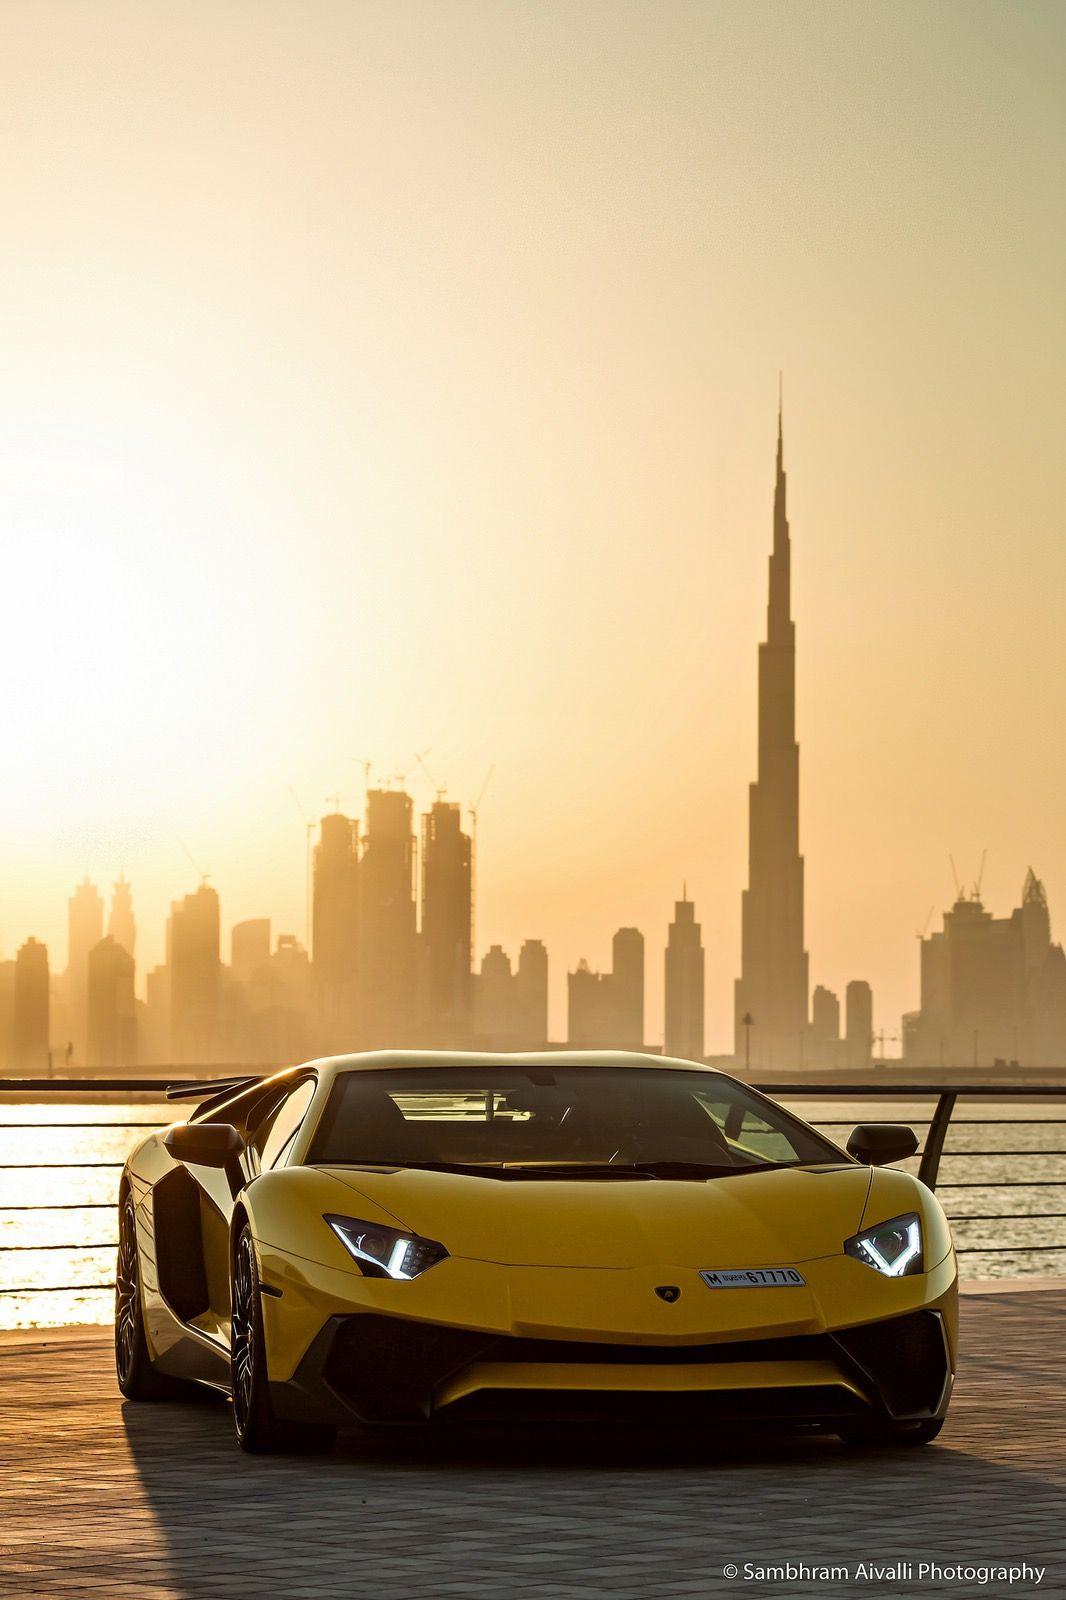 World S Most Expensive Model Car Golden Lamborghini Gold Lamborghini Super Cars Expensive Cars